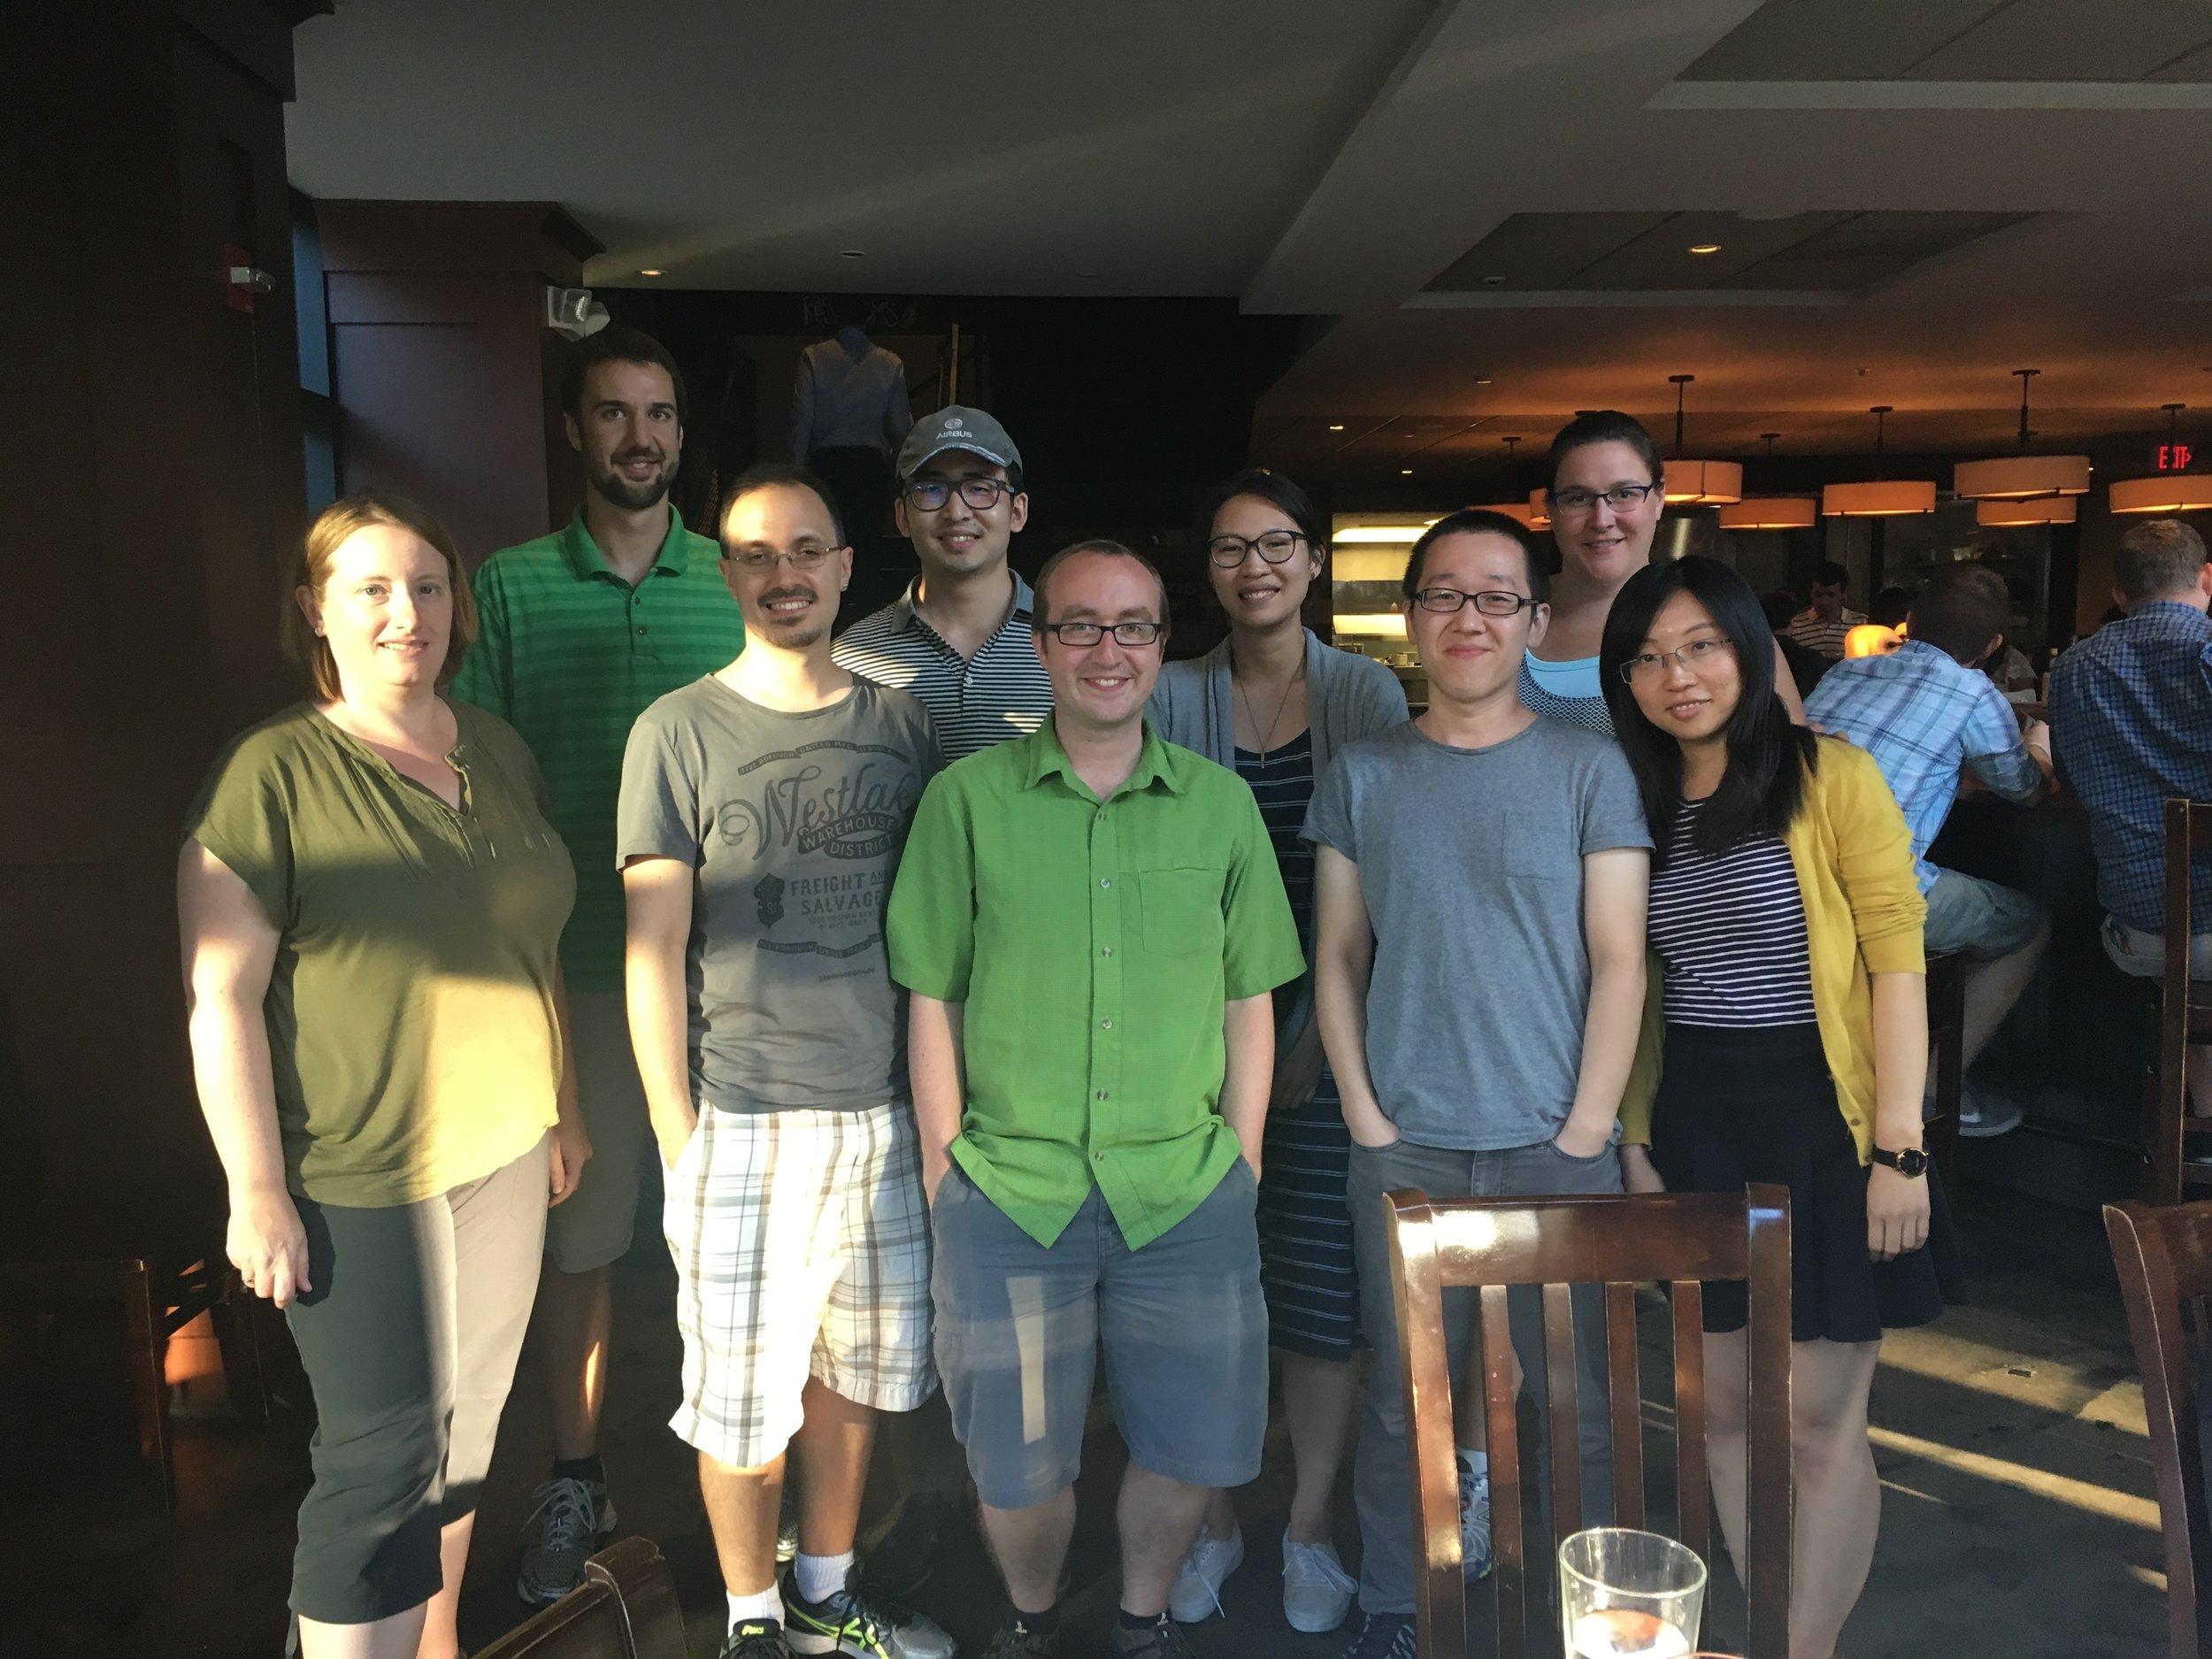 Group celebration of three new PhDs!